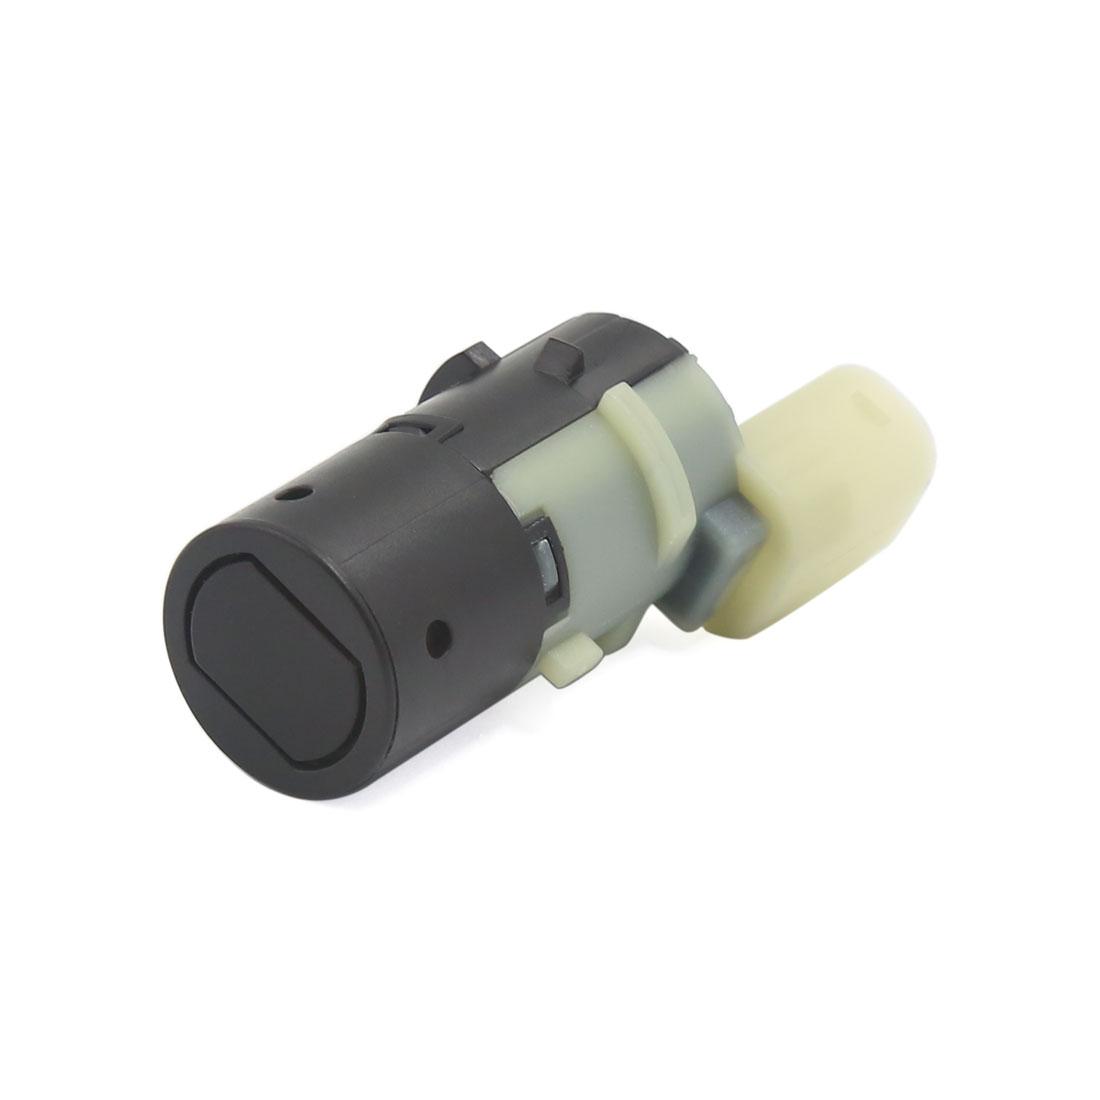 Car PDC Parking Sensor 66216902180 for BMW 3 Series E46 M3 330 330xd 320 318